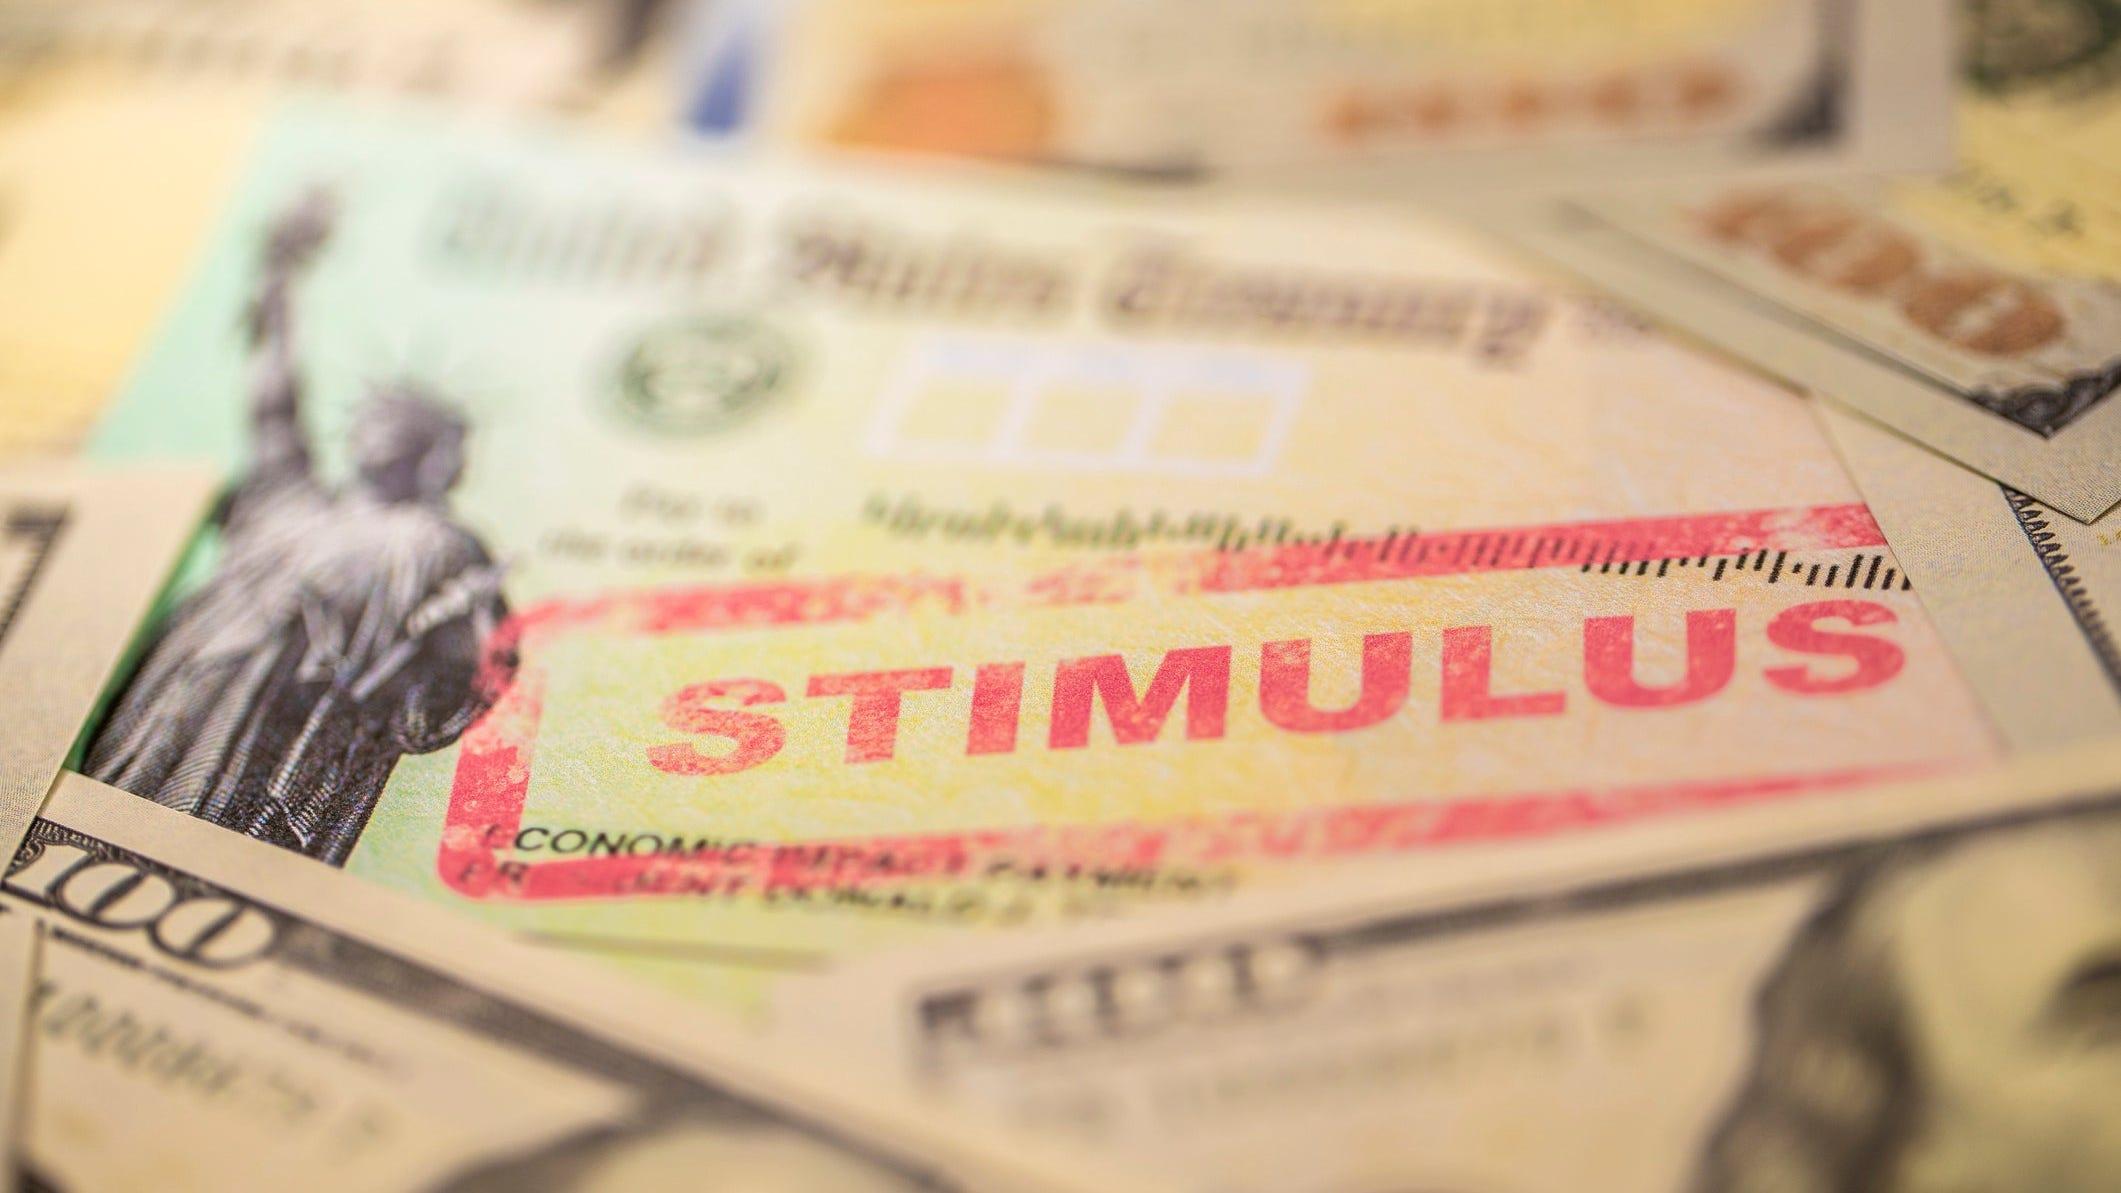 Stimulus checks: Rev and Tax finalizing plan for distribution